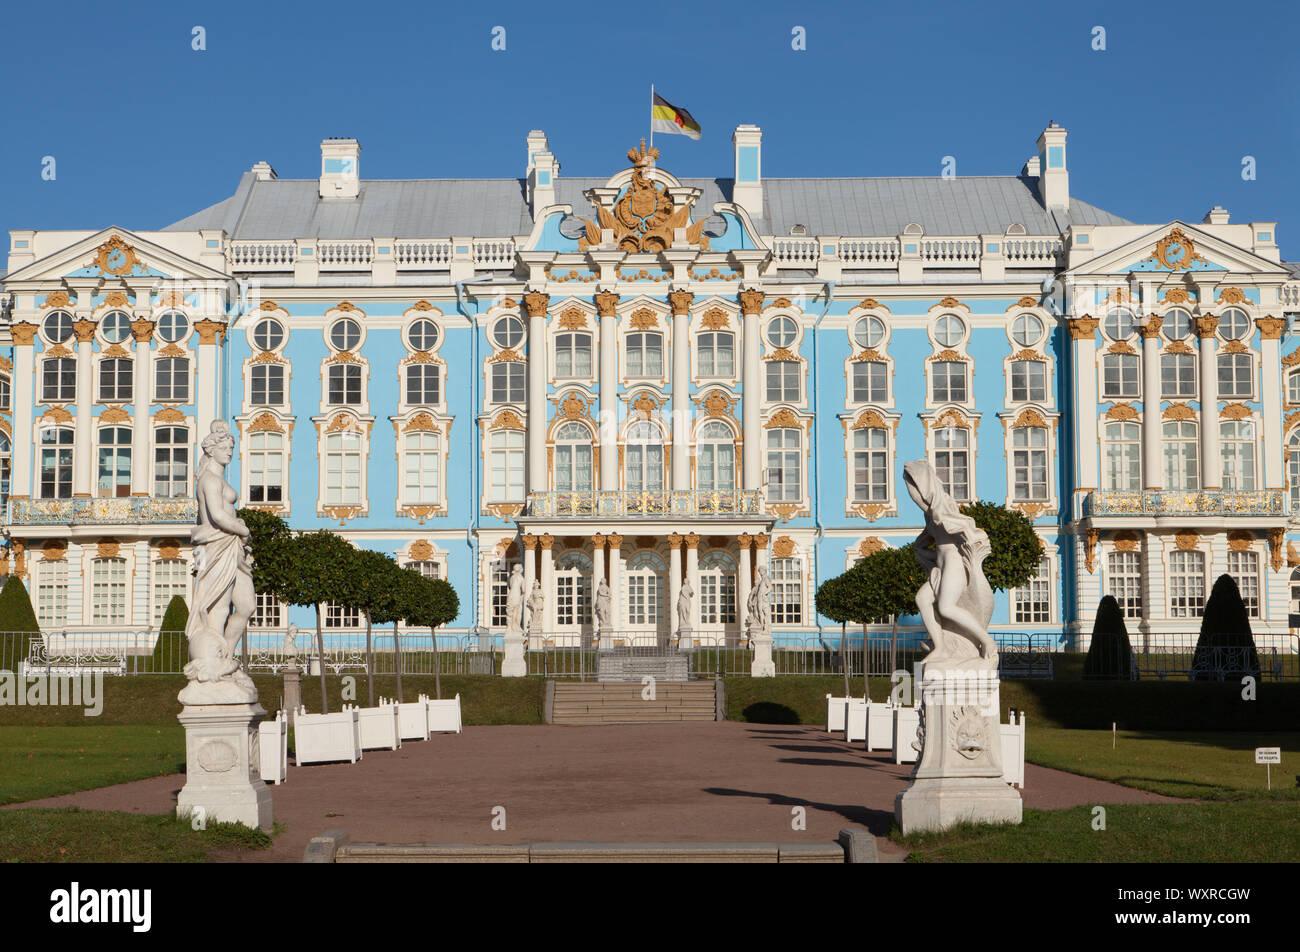 Catherine Palace, Catherine Park, Tsarskoe Selo, Pushkin, Russia. Stock Photo